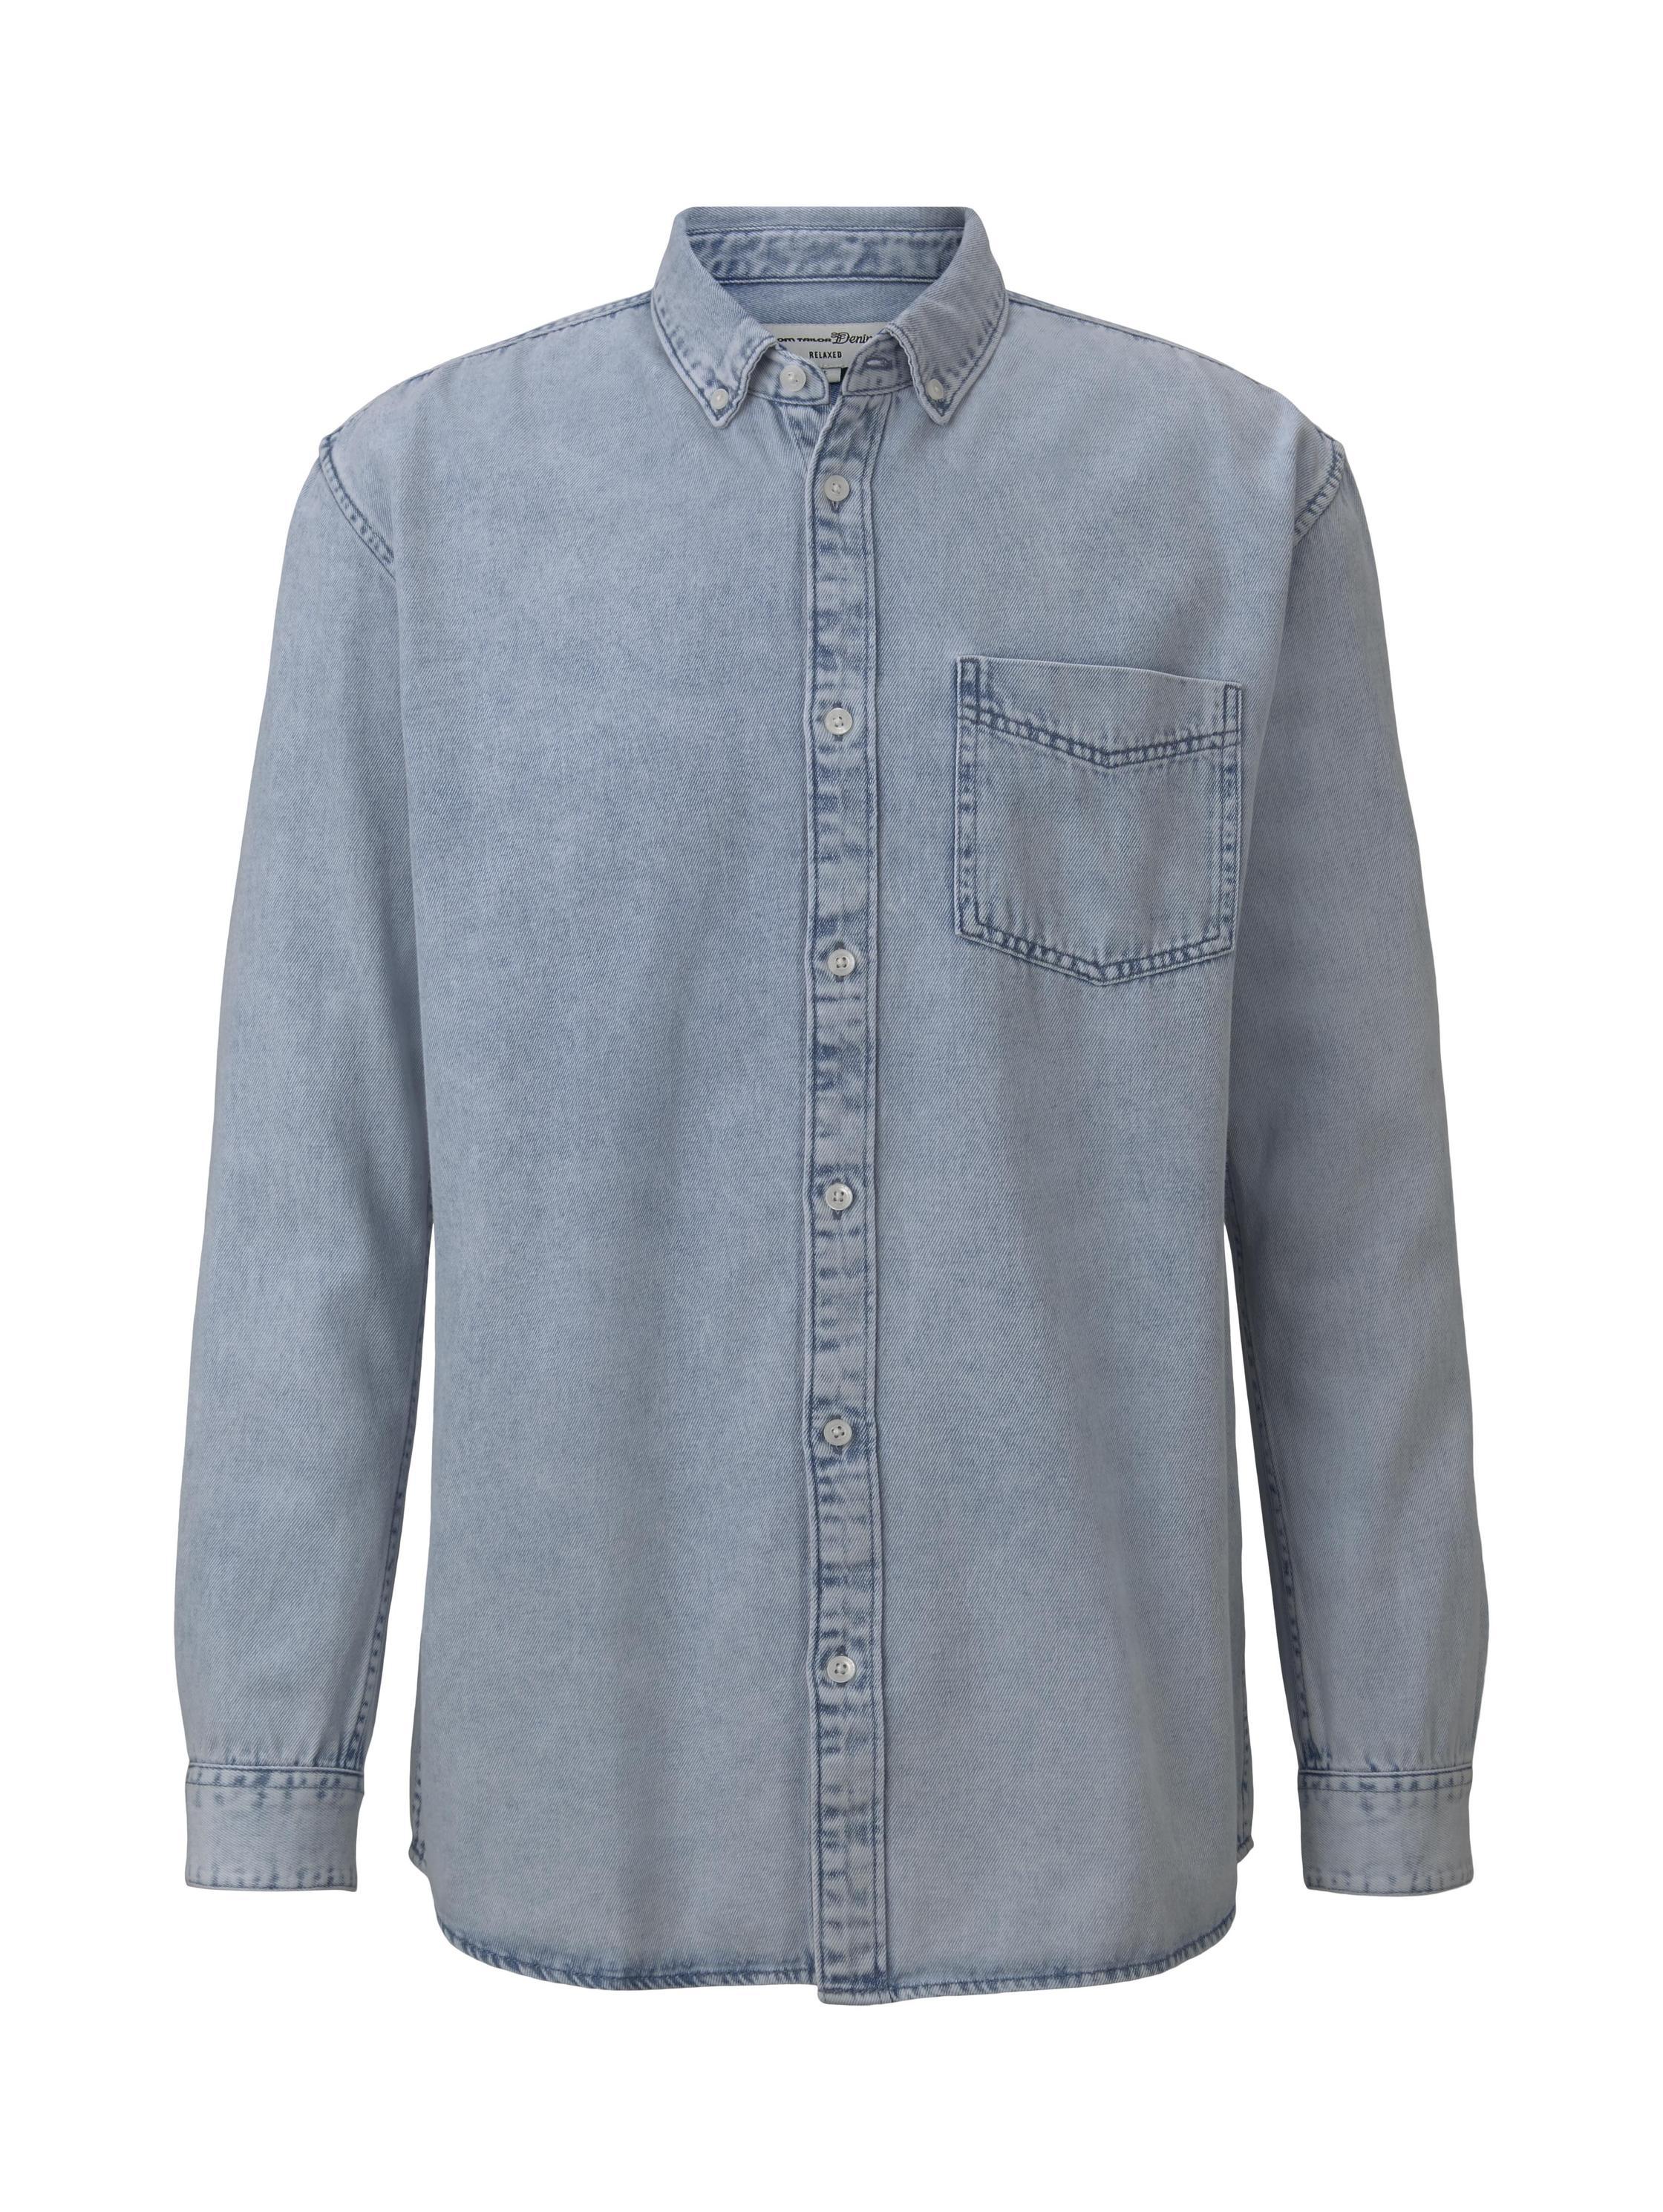 denim shirt, Heavy Bleached Blue Denim